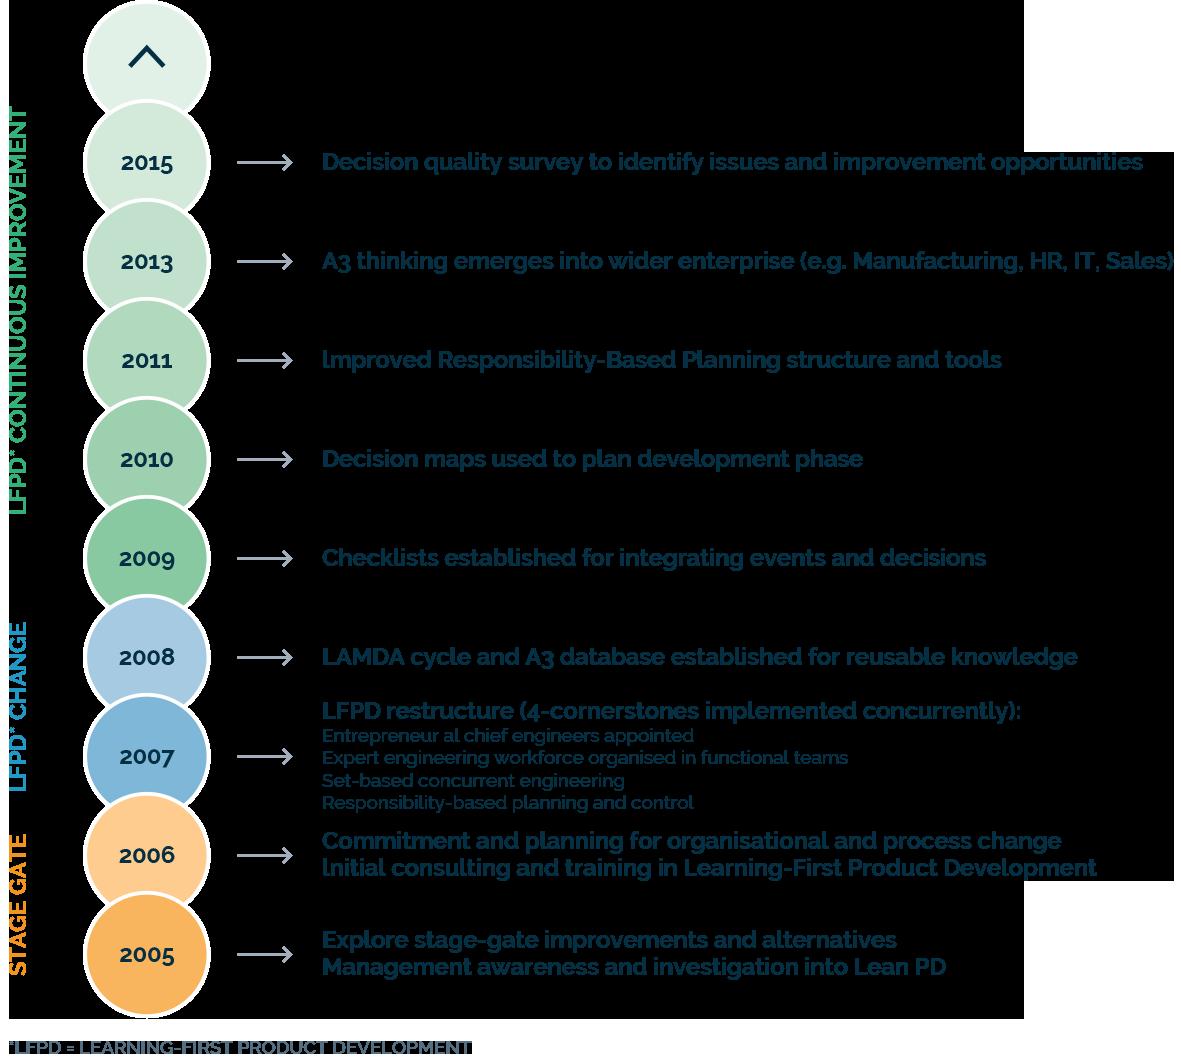 Fisher & Paykel's Lean Product Development Journey – Lean